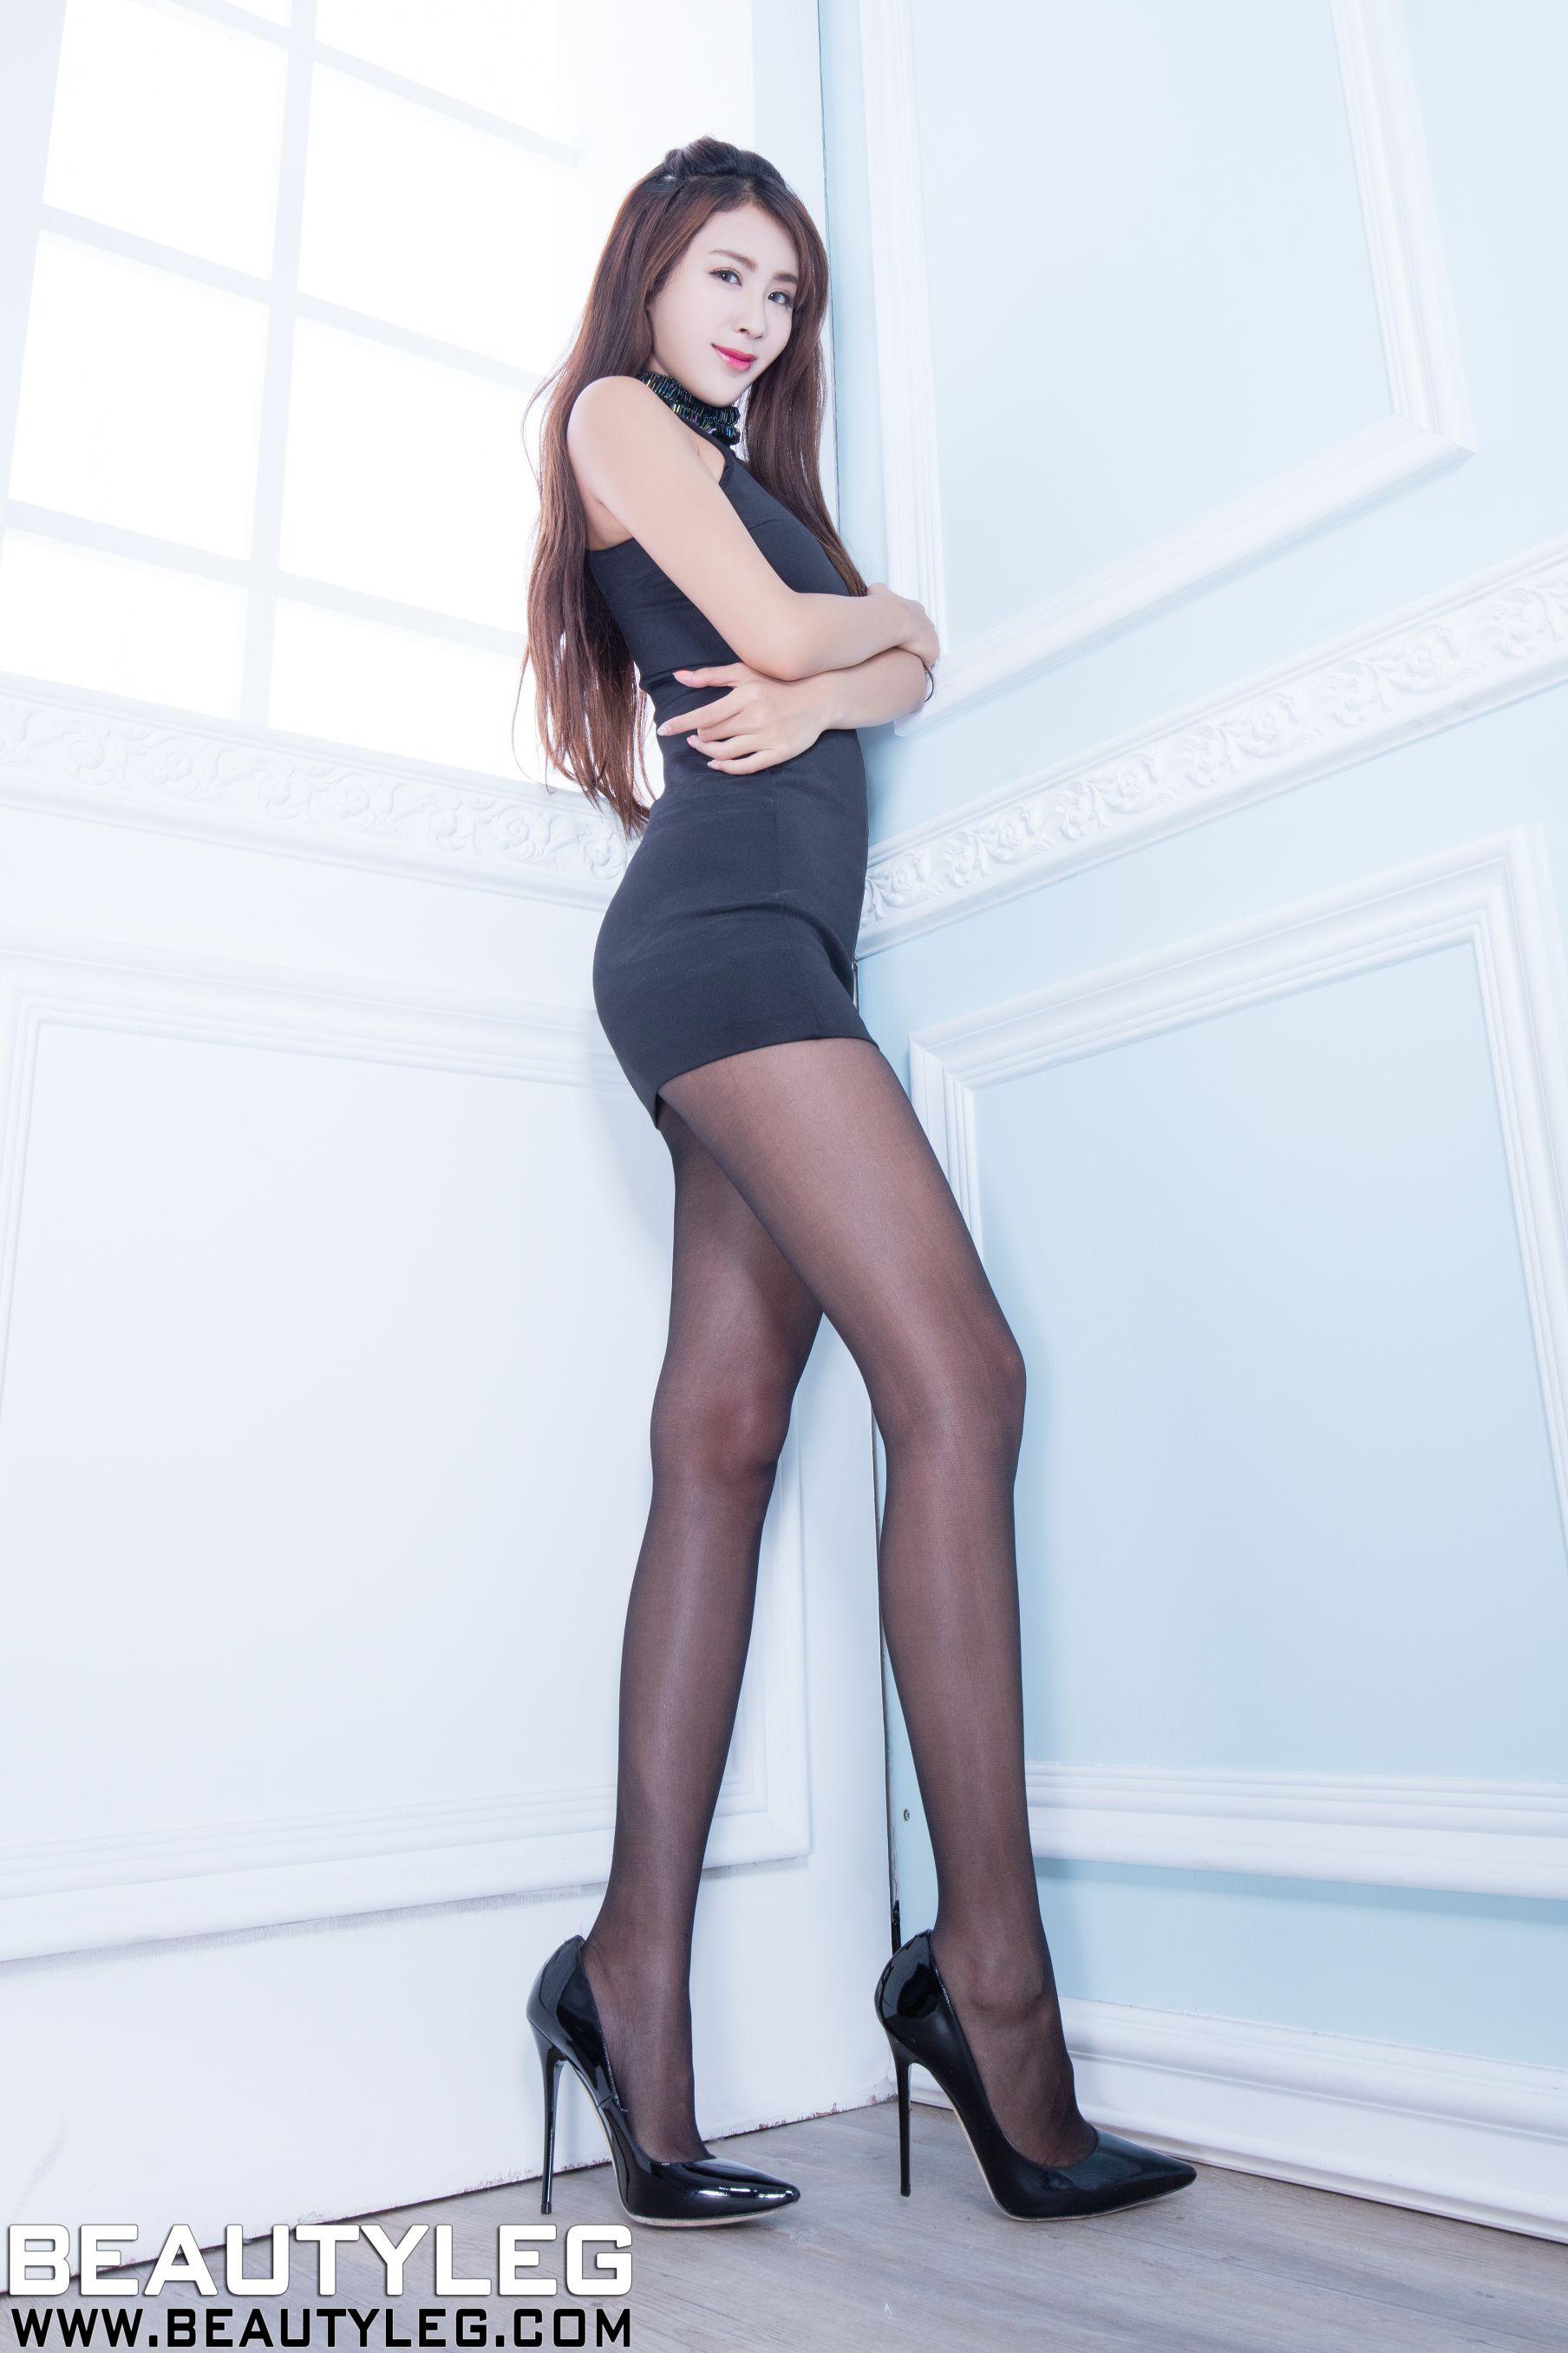 VOL.817 [Beautyleg]美腿黑丝:夏晴(夏晴Miso,腿模Miso)高品质写真套图(43P)